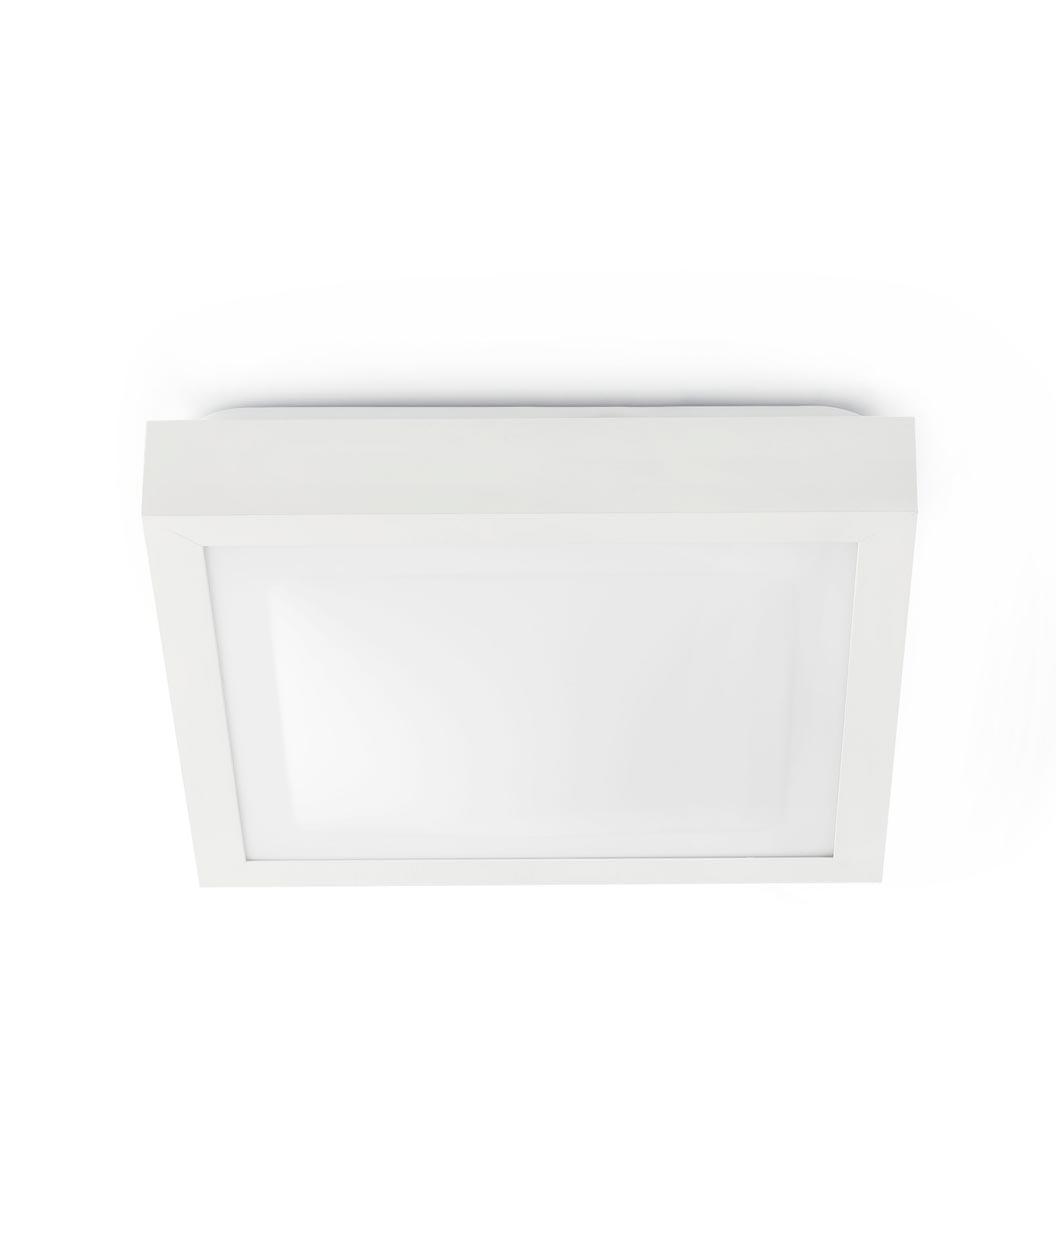 Plafón blanco 2 luces TOLA